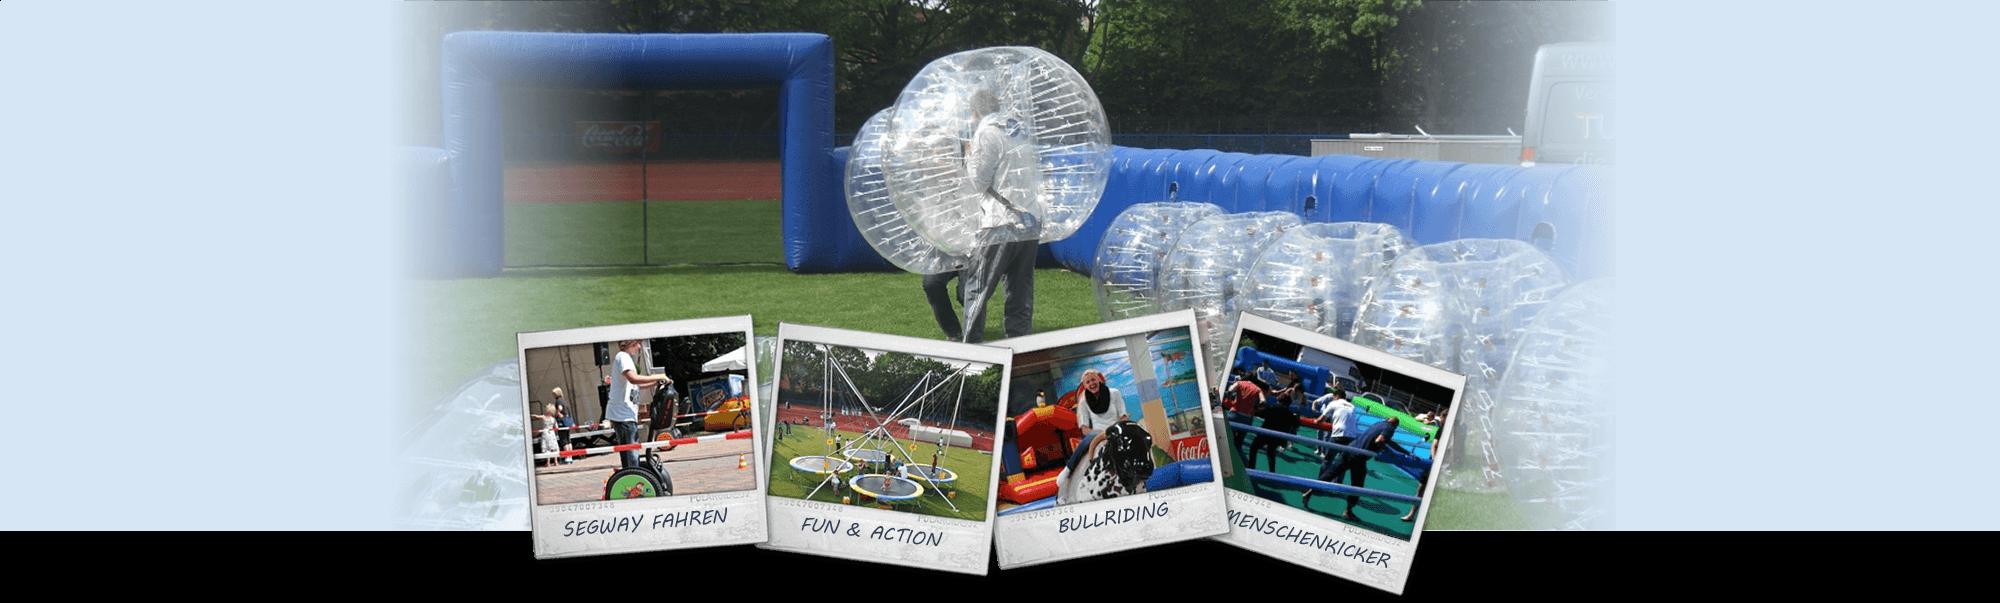 Slide-Bumperball-Event-Verleih